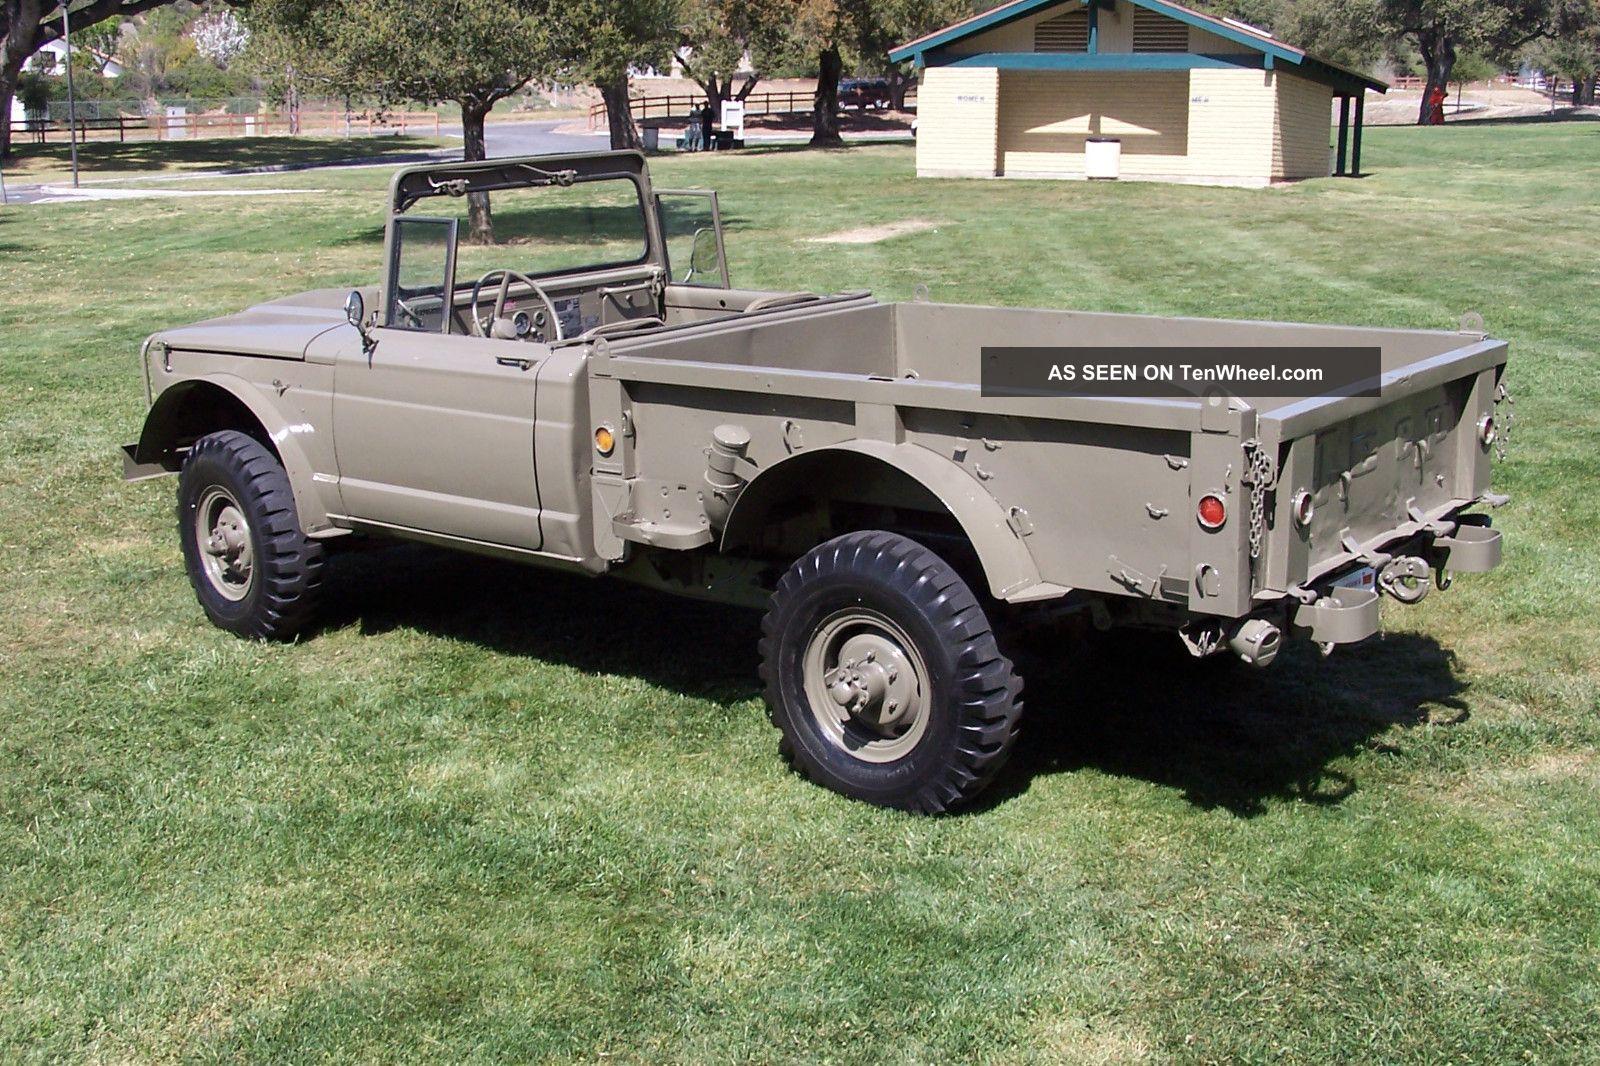 Jeep Kaiser Military M M Truck X Ton Five Quarter Lgw on Custom Jeep Kaiser M715